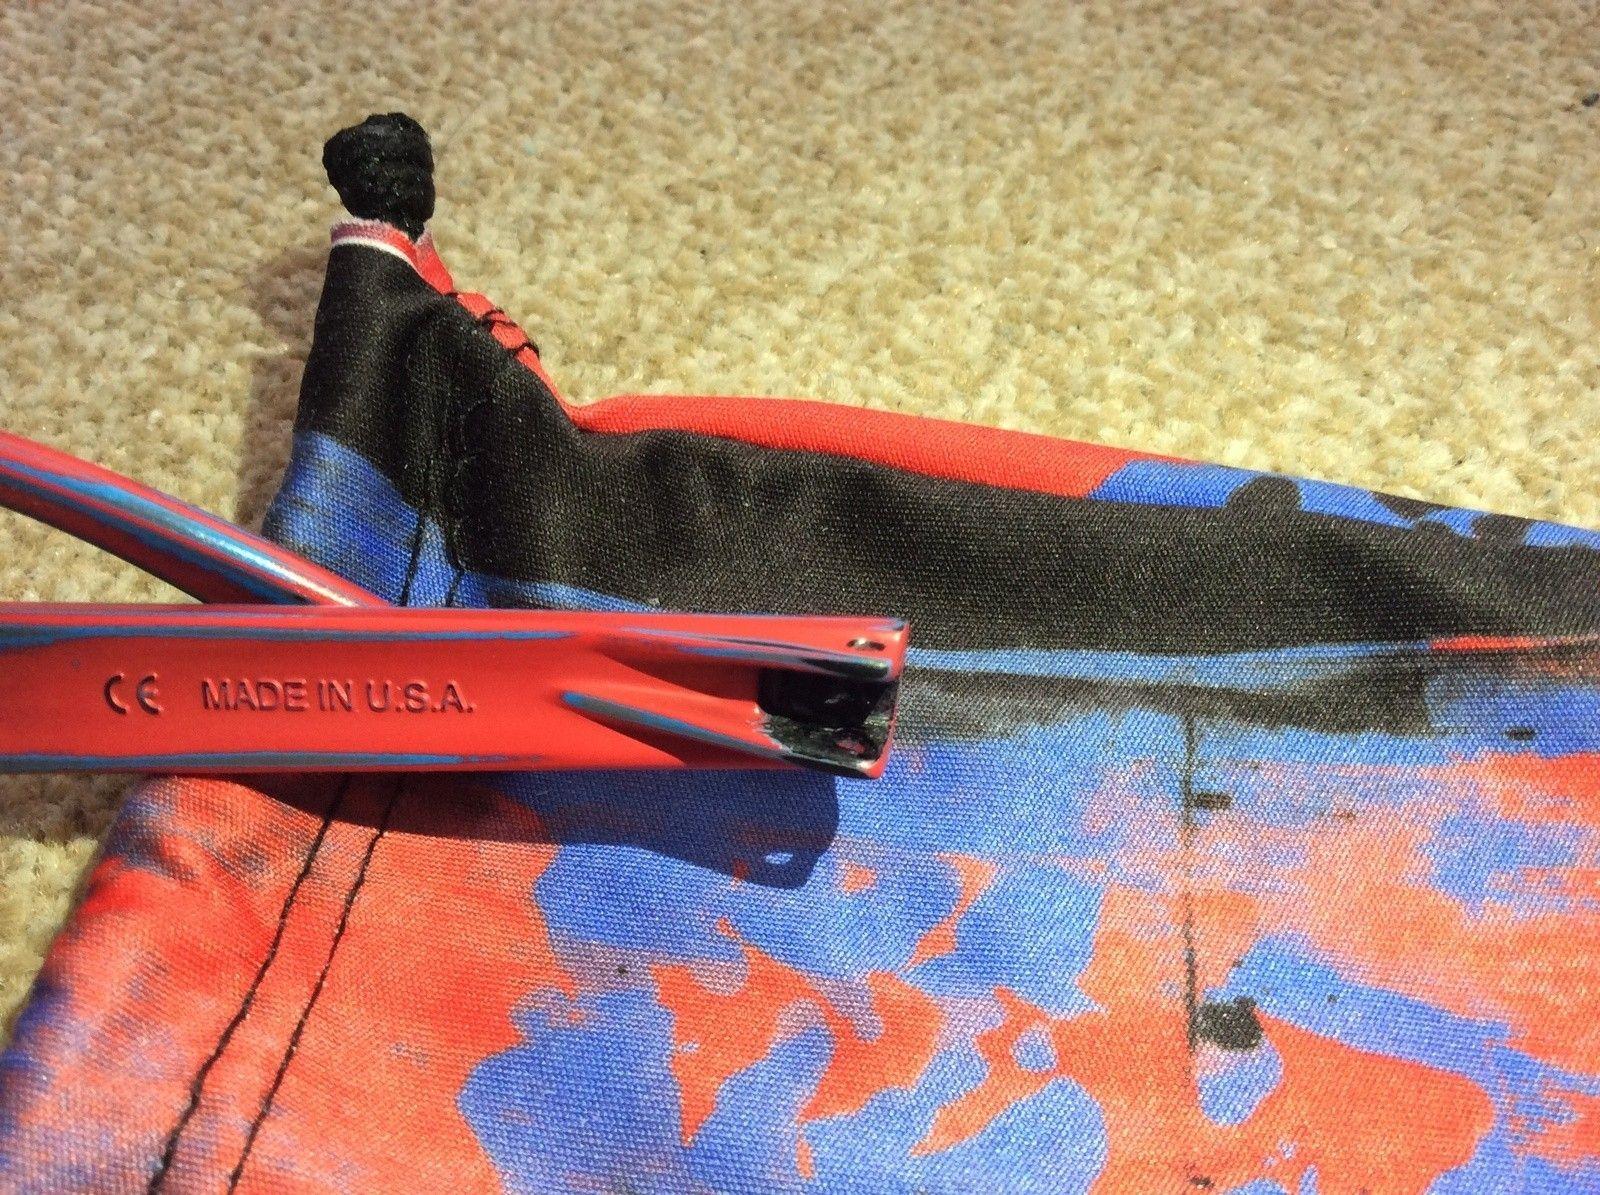 Repairing Frogskin arms?? / O-Matter & PlasticWeld - image.jpg